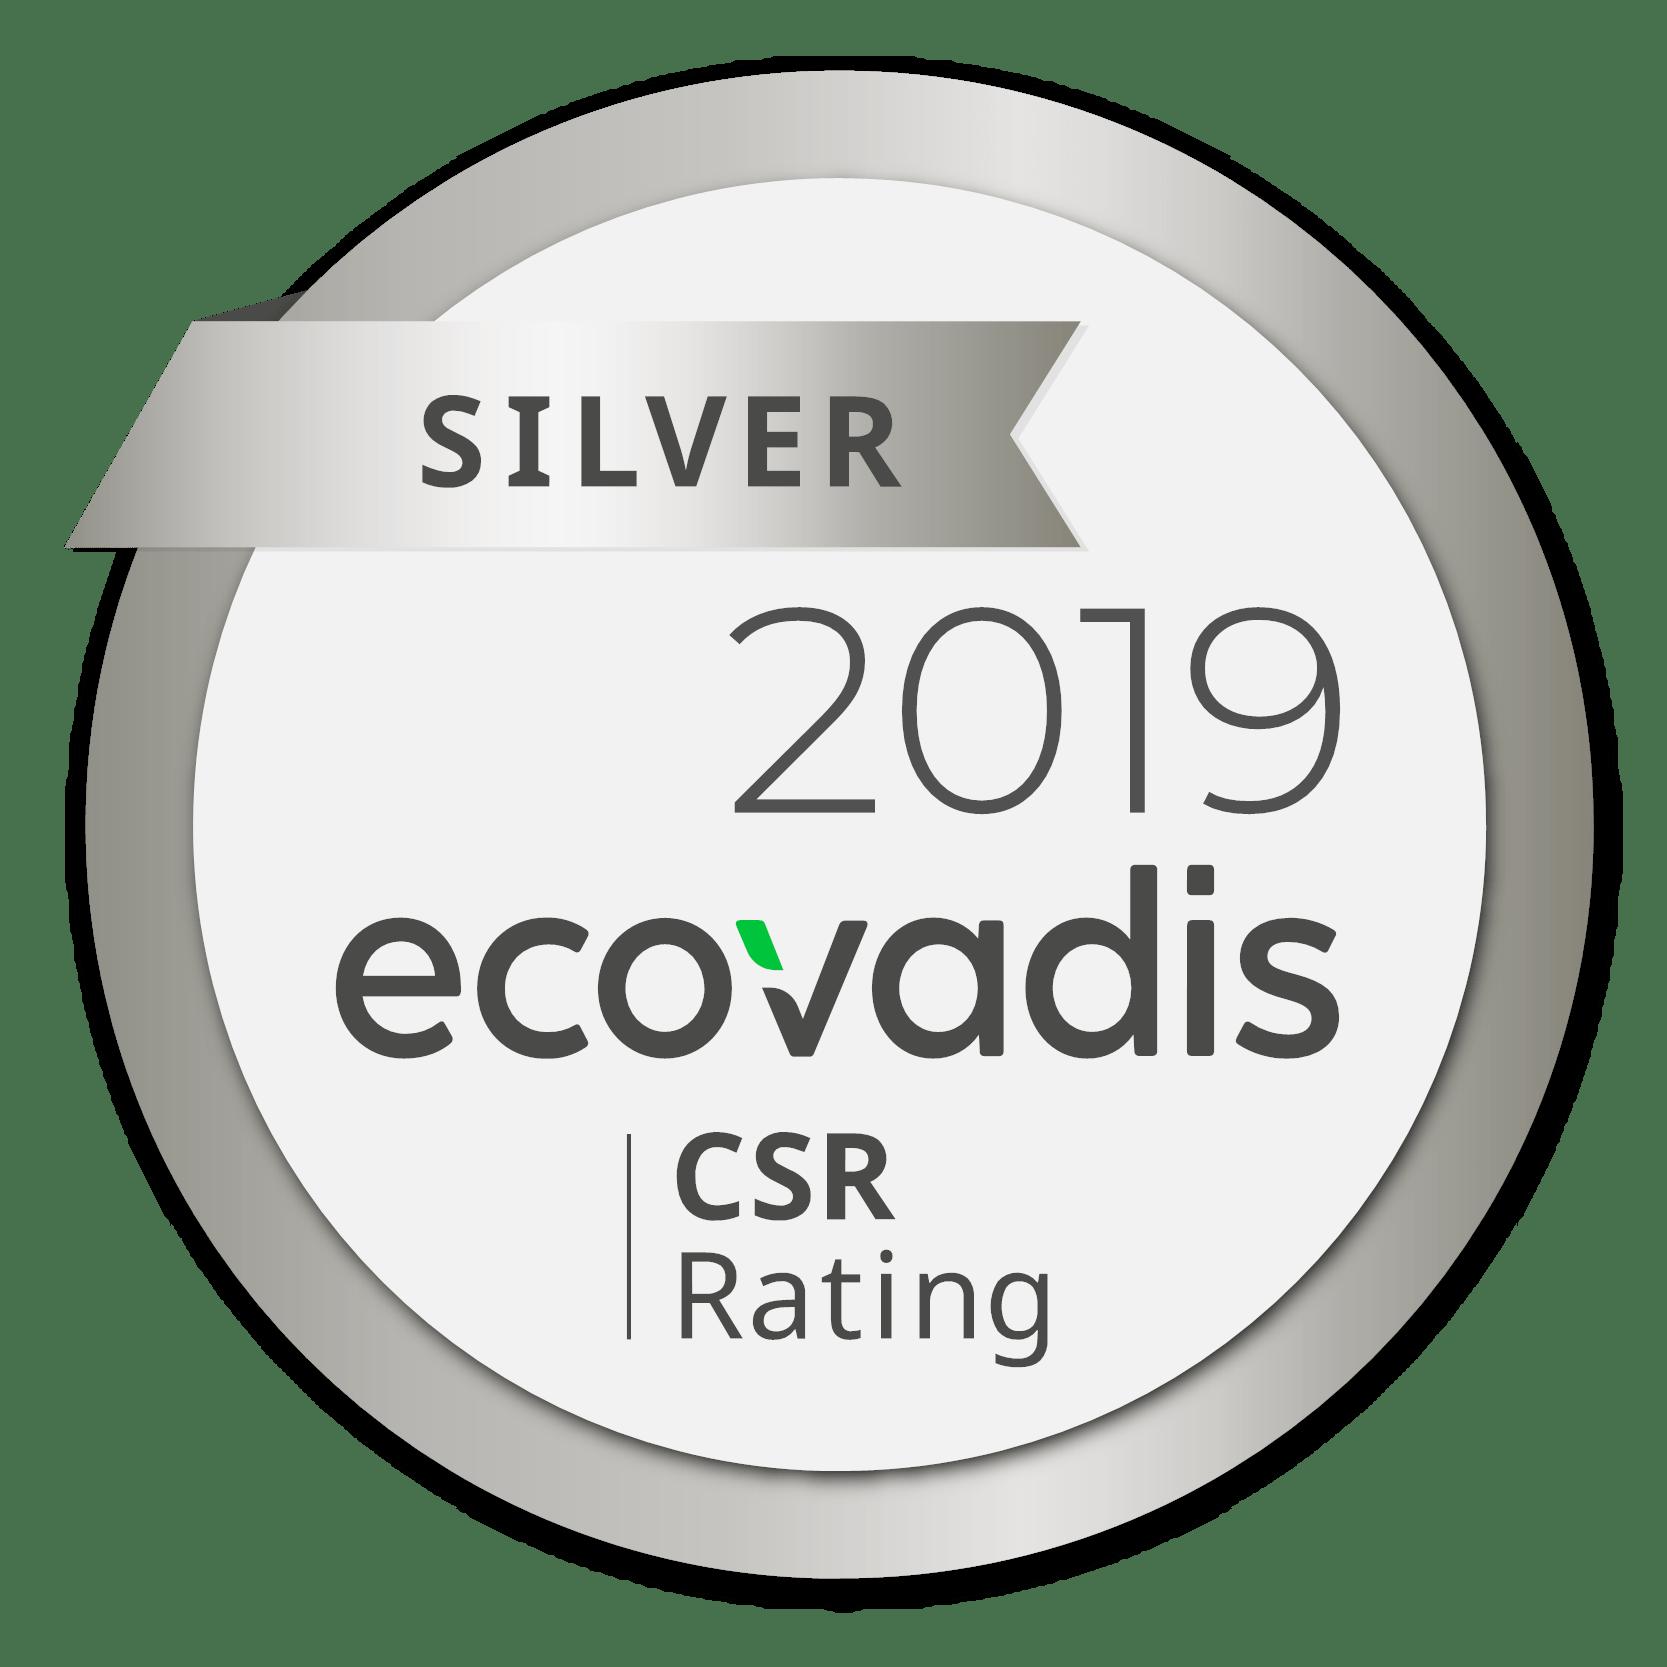 Silver ecovadis 2019